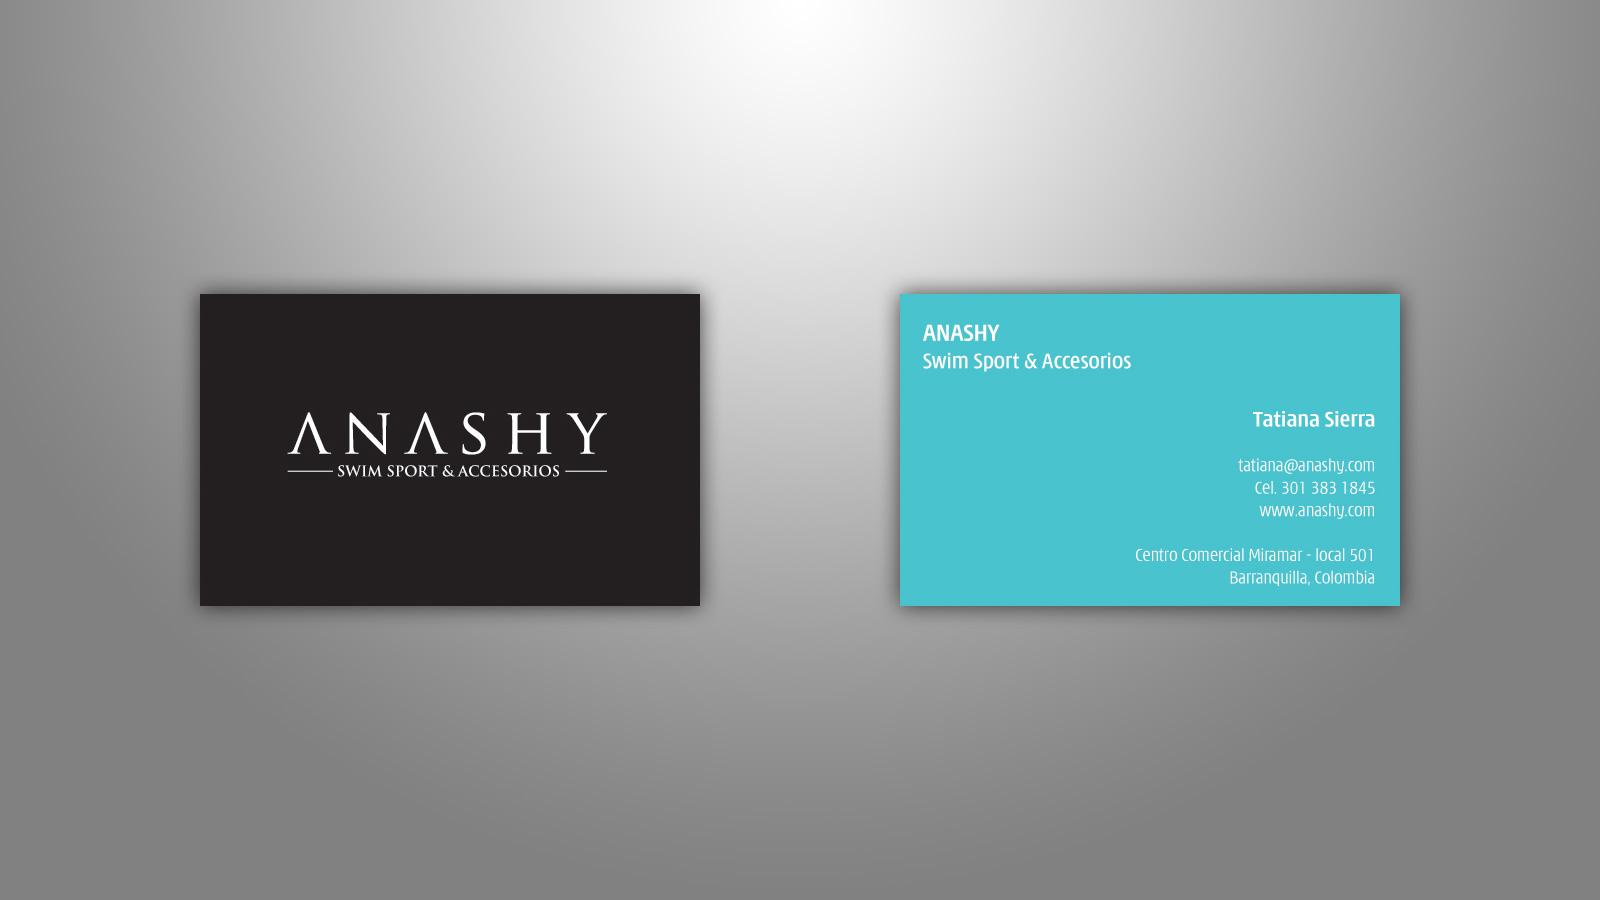 sublime-digital_anashy-identity-04